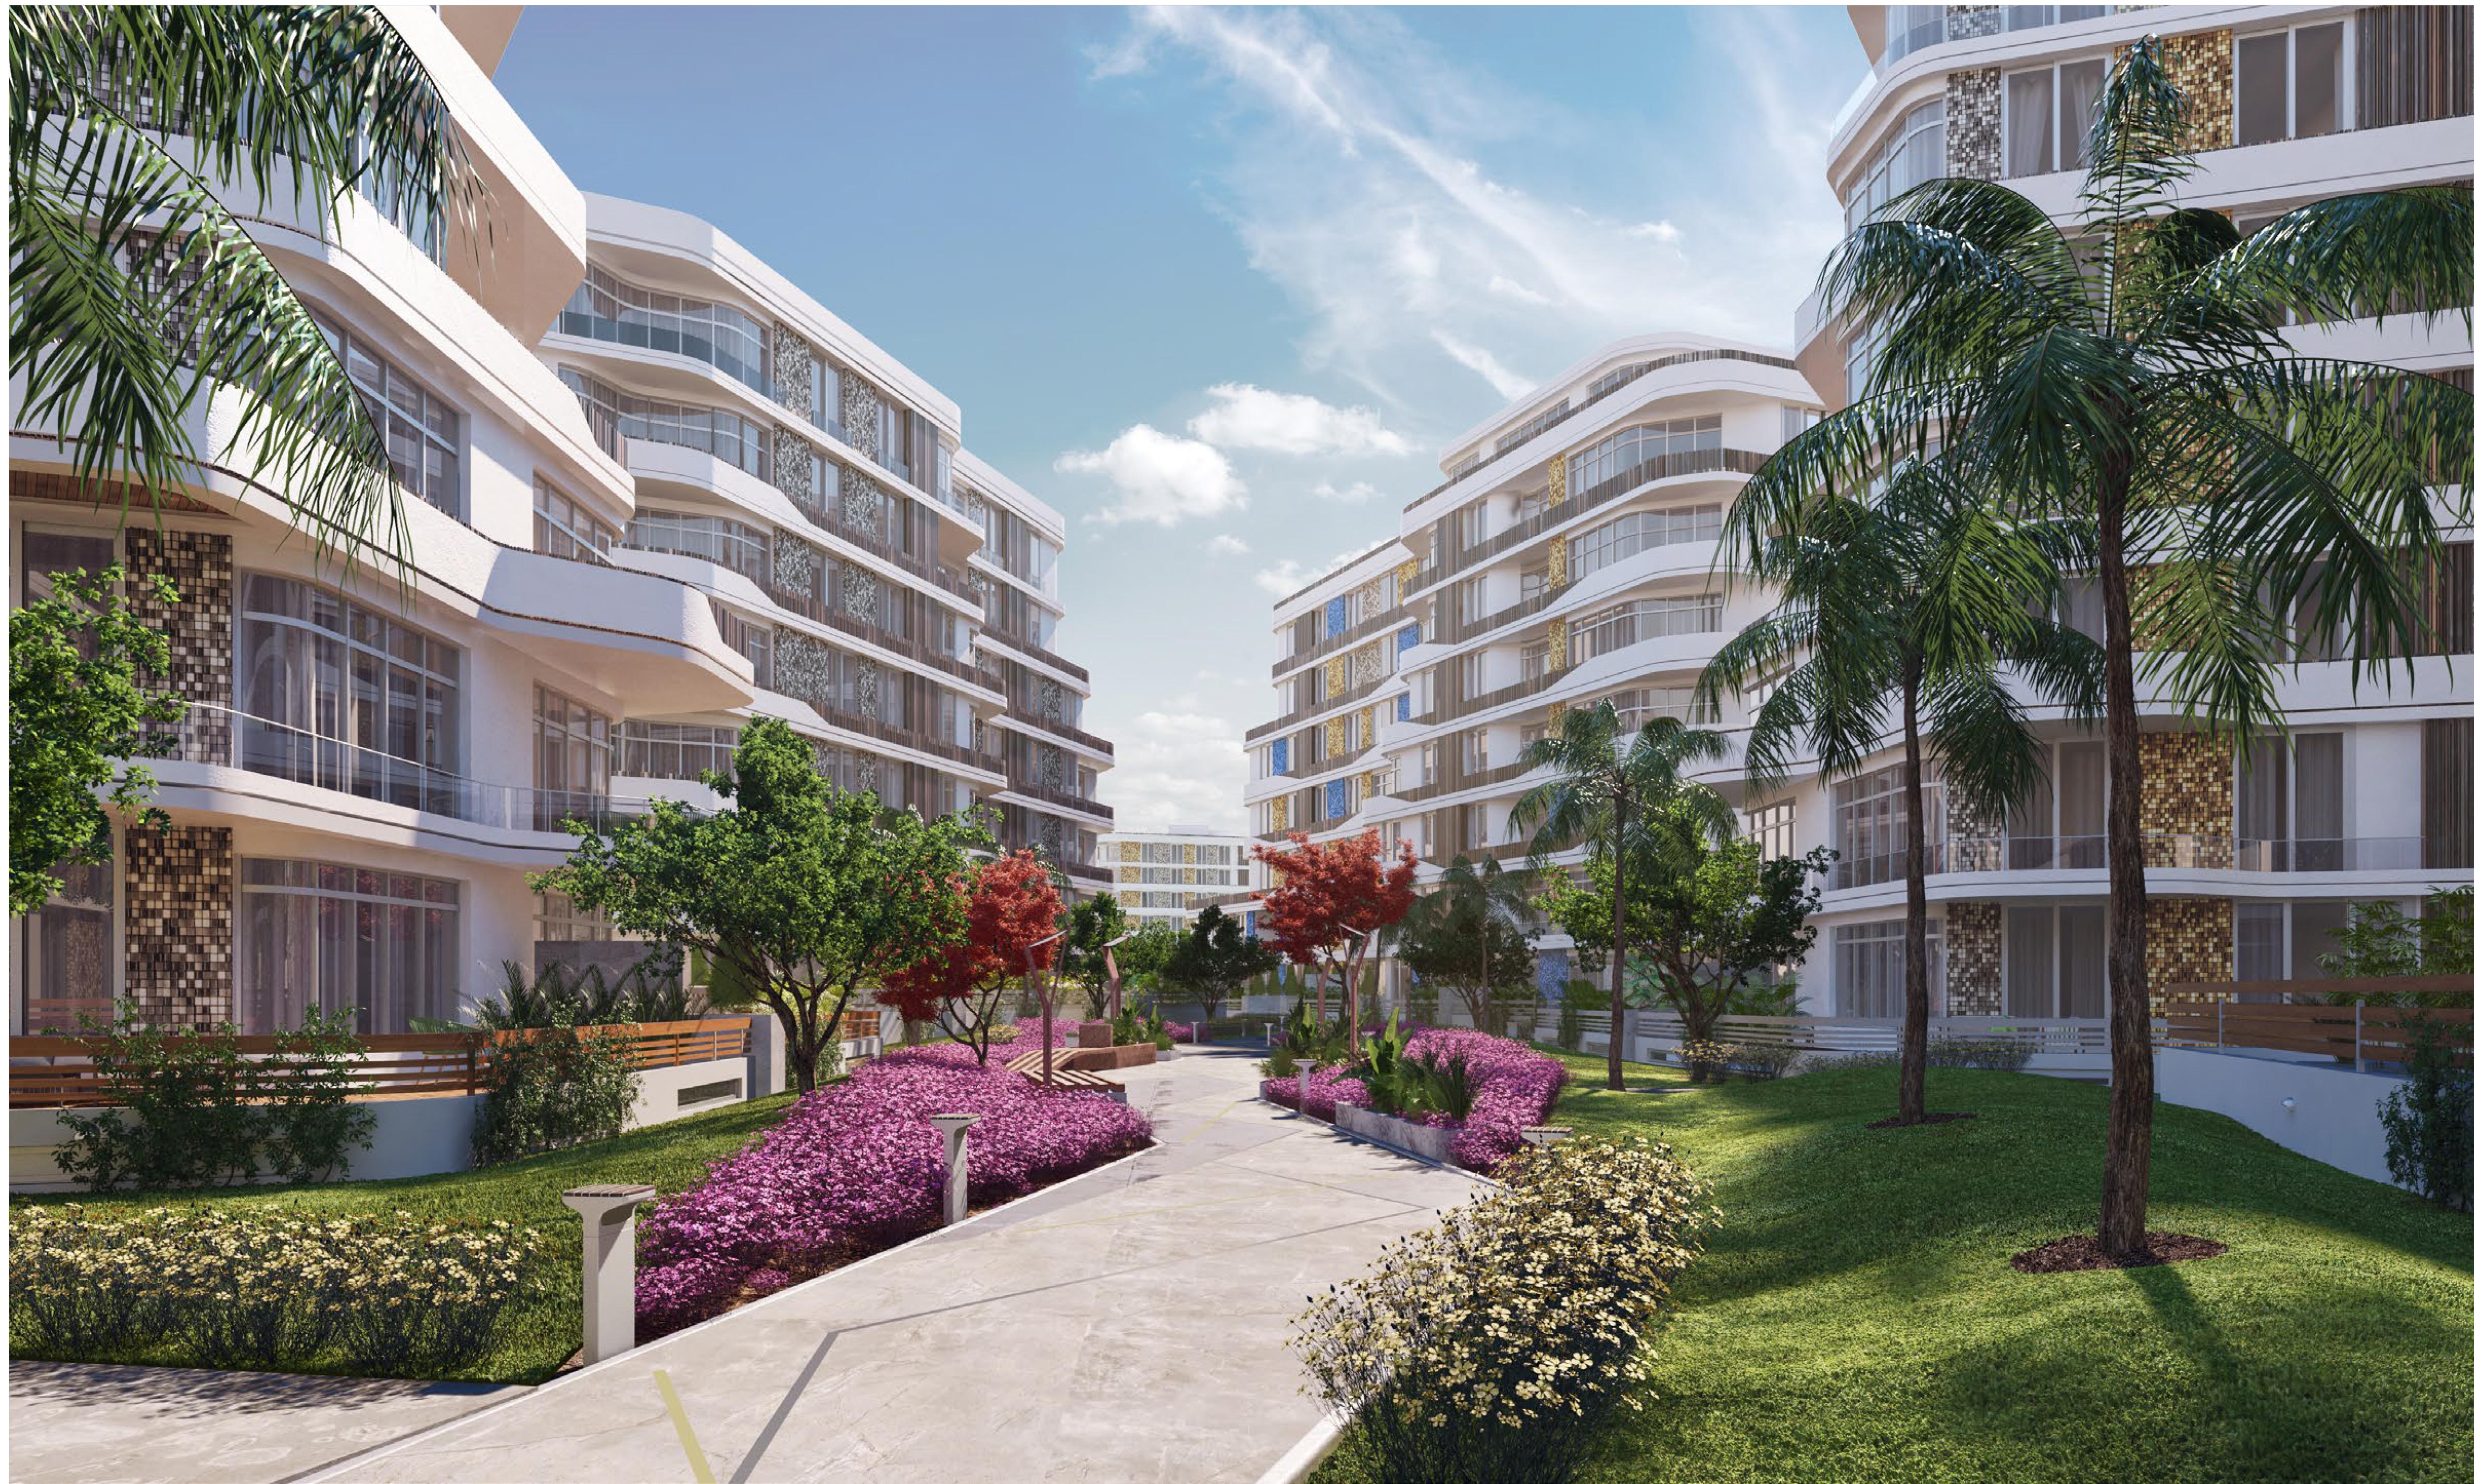 Bloomfields - Future City